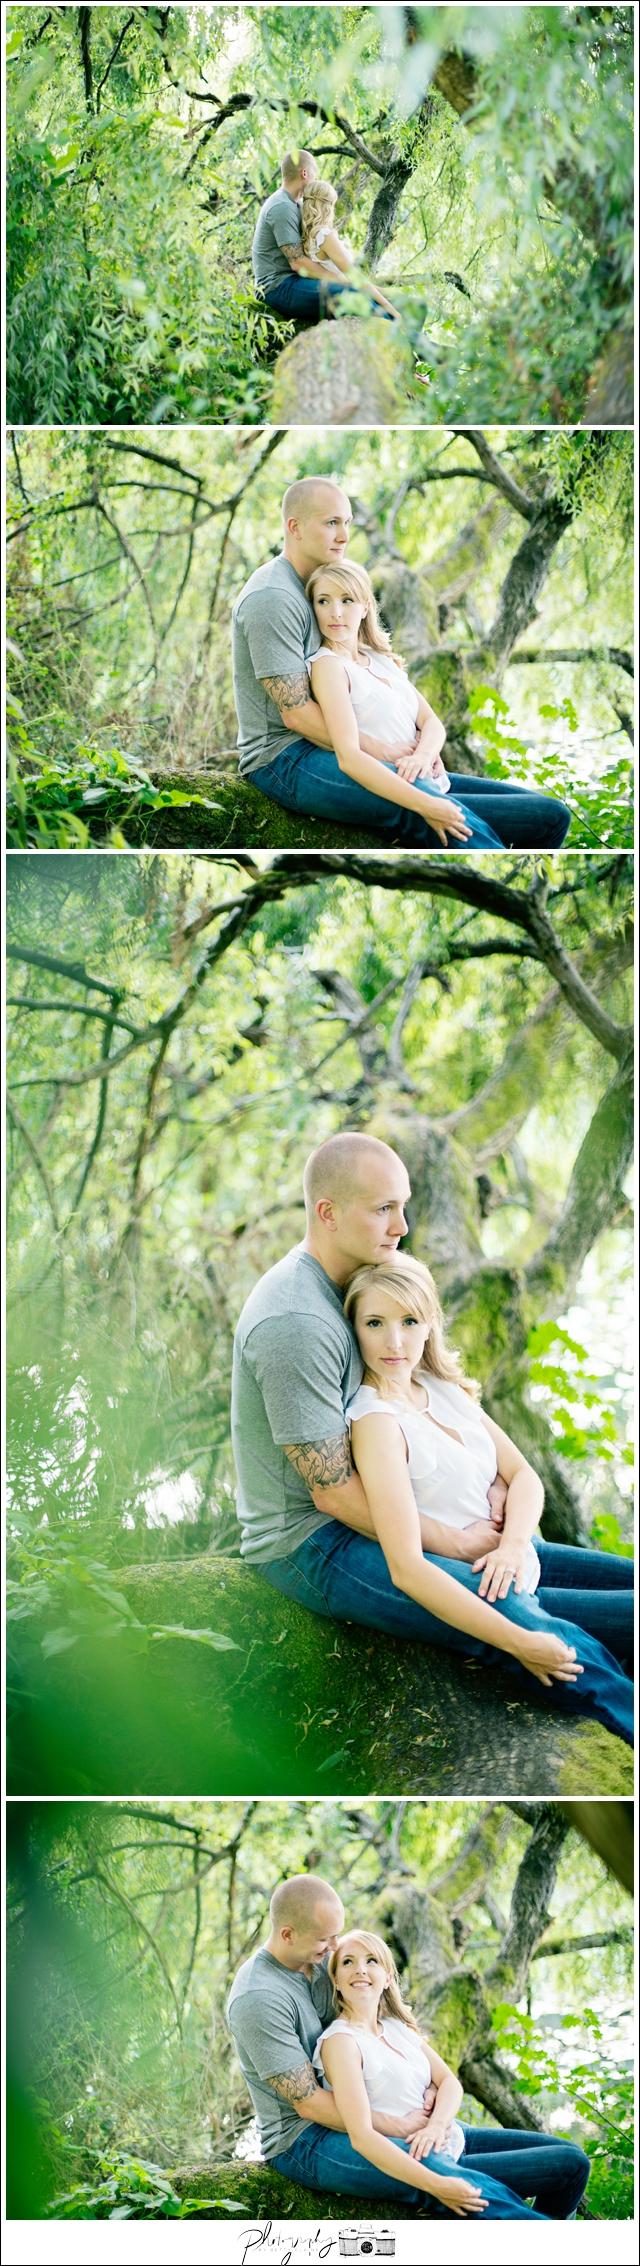 3-Washington-Park-Arboretum-willow-tree-climbing-tree-engagement-portraits-Seattle-wedding-photographer